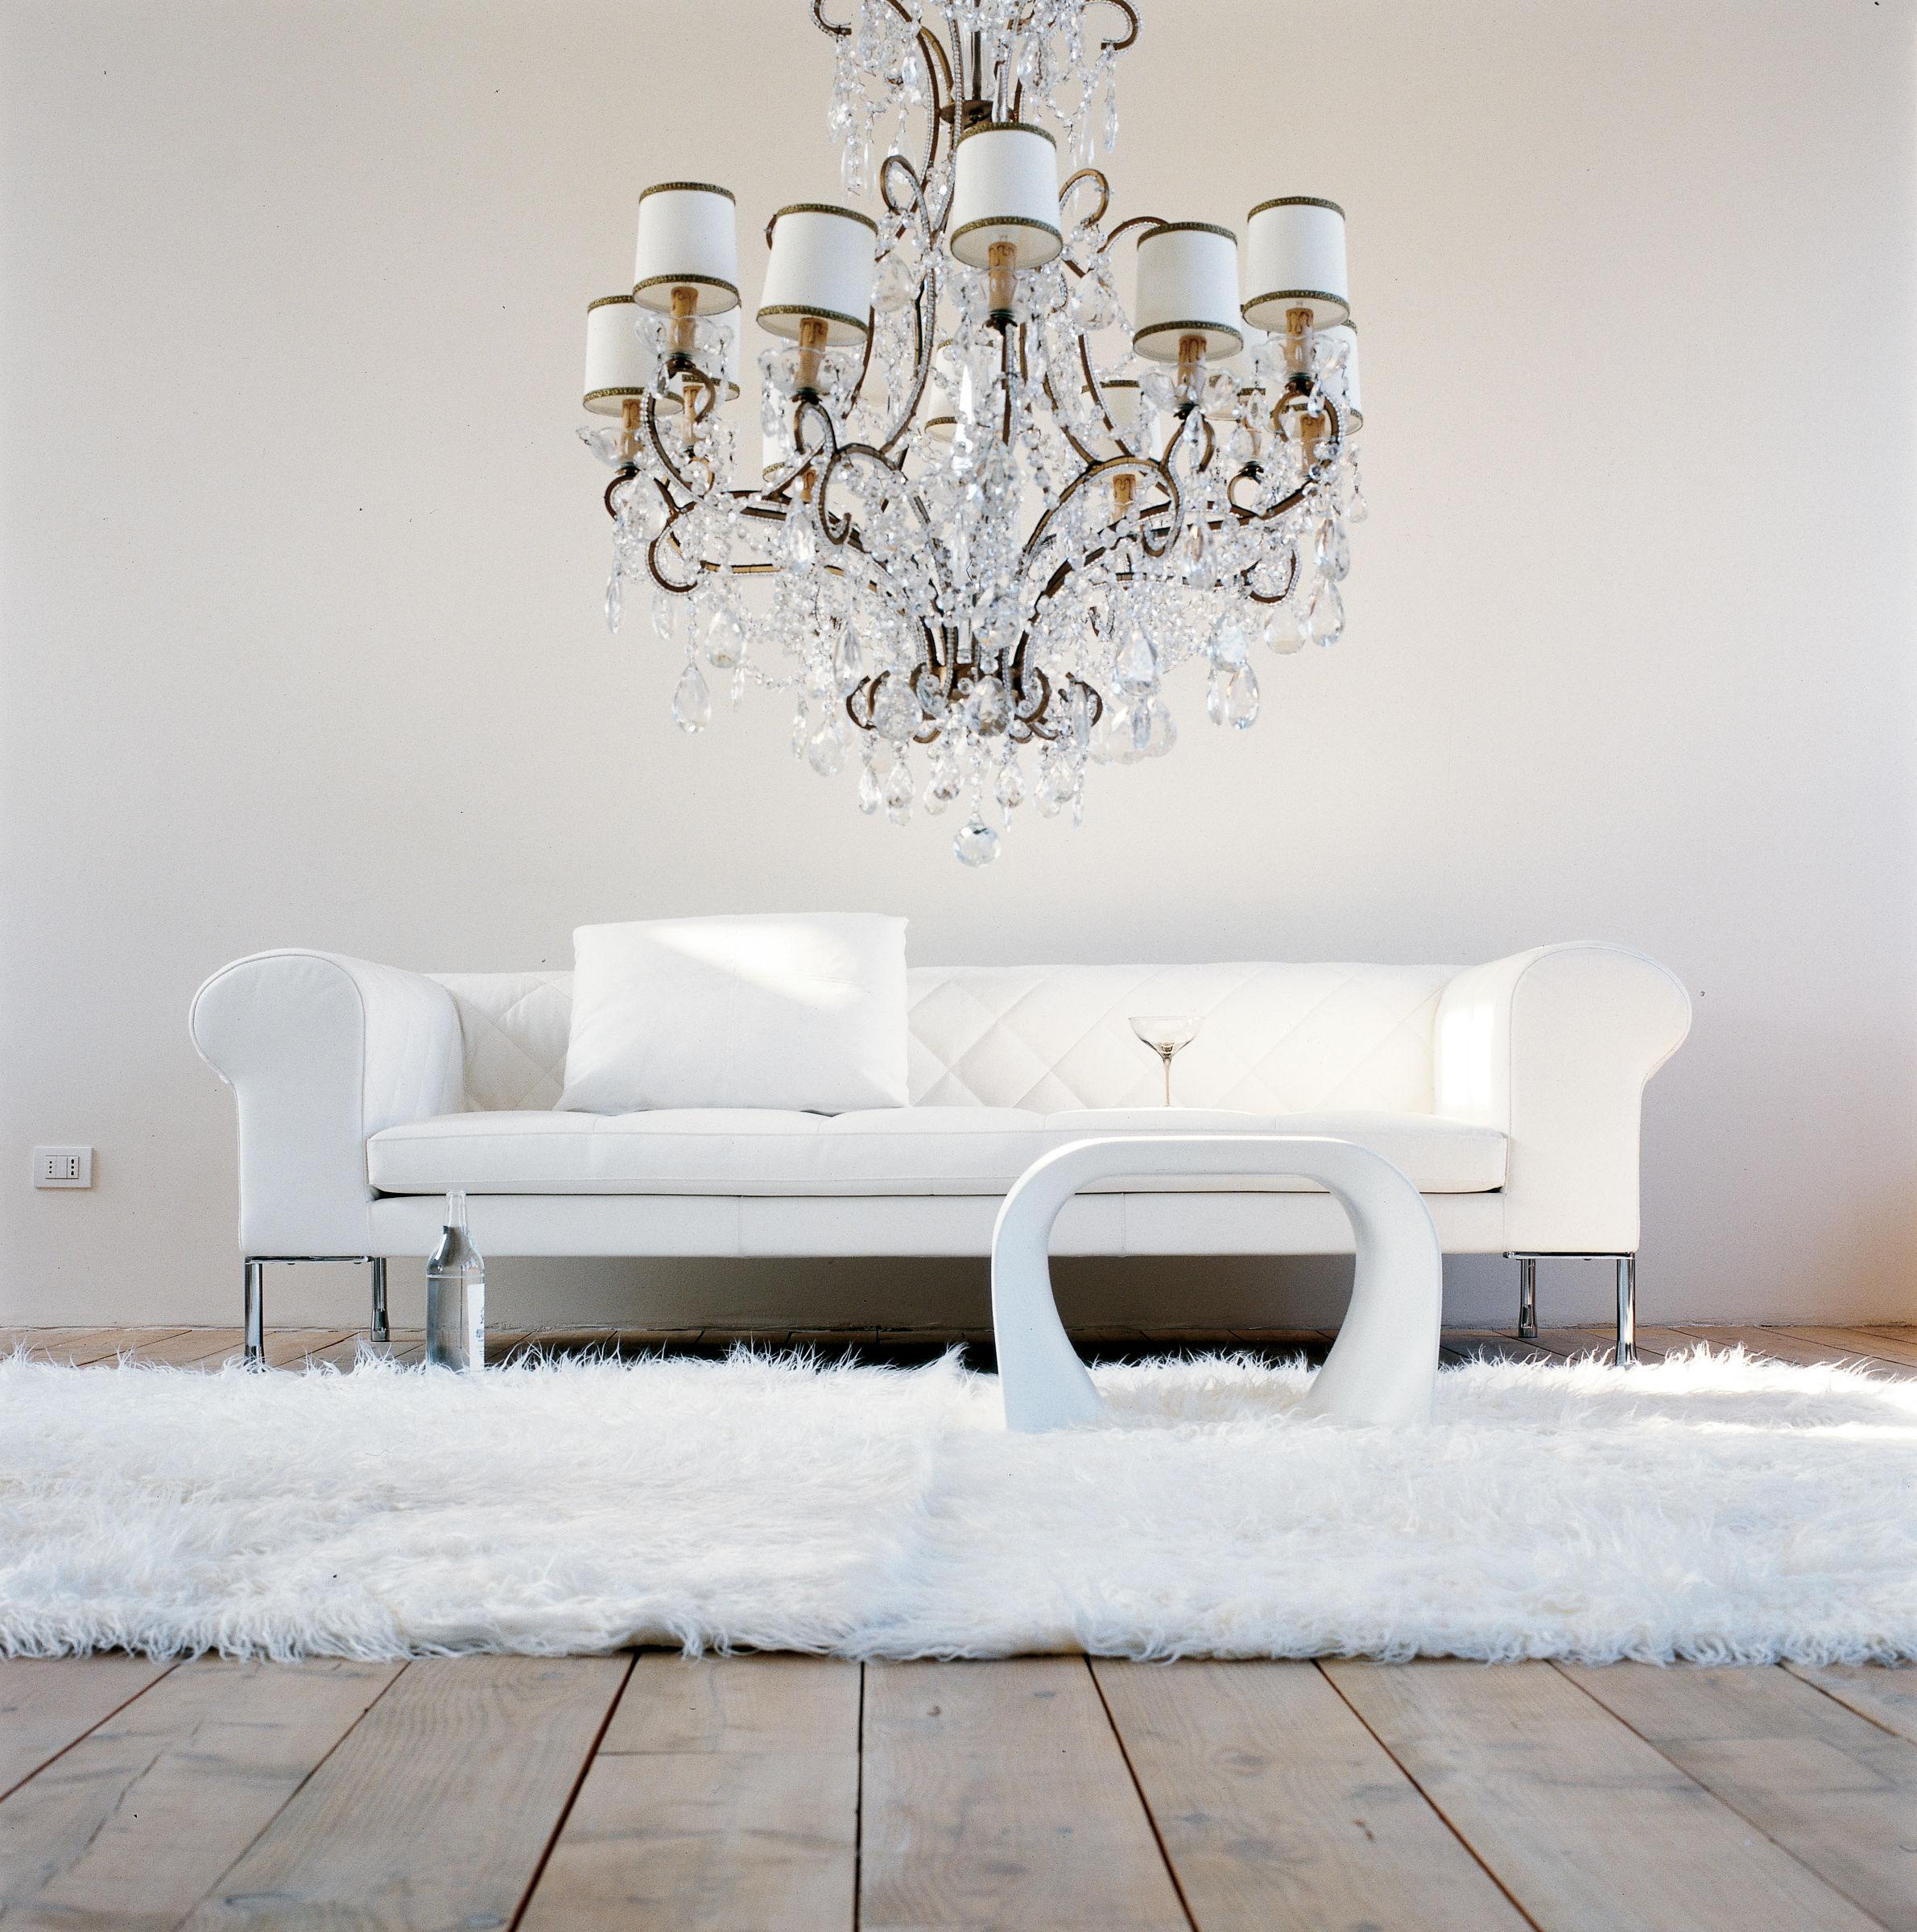 barocco stoff 3 sitzer l 236 cm zanotta sofa. Black Bedroom Furniture Sets. Home Design Ideas